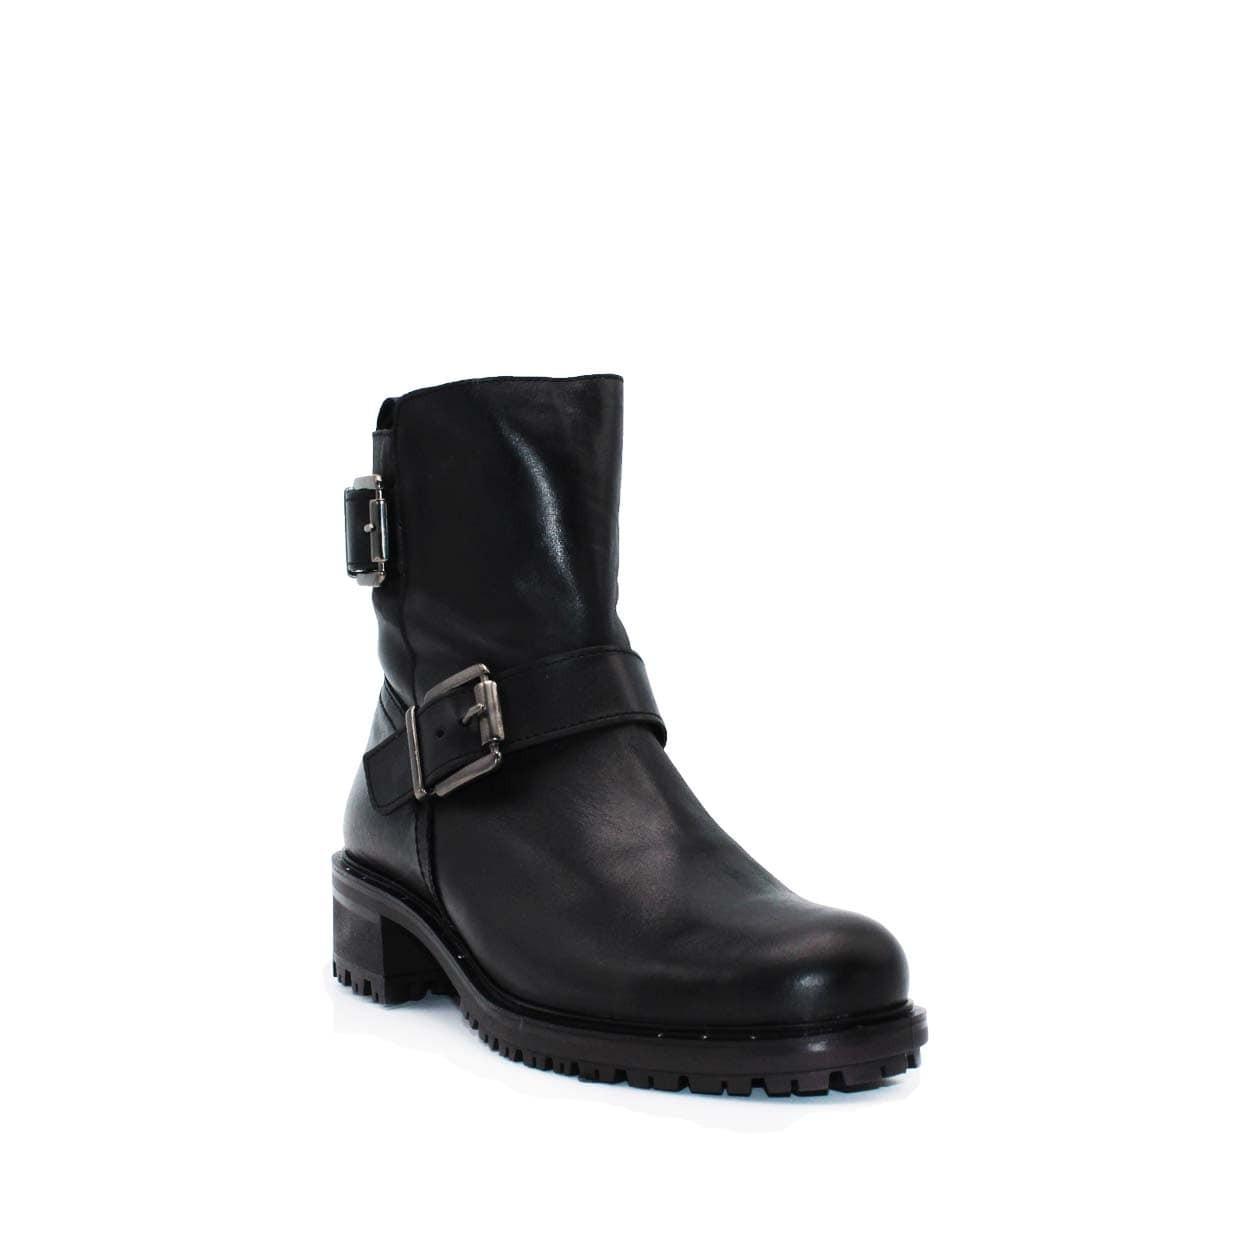 484624a27e0 WONDERS - WONDERS - BRANDS   Papanikolaou Shoes